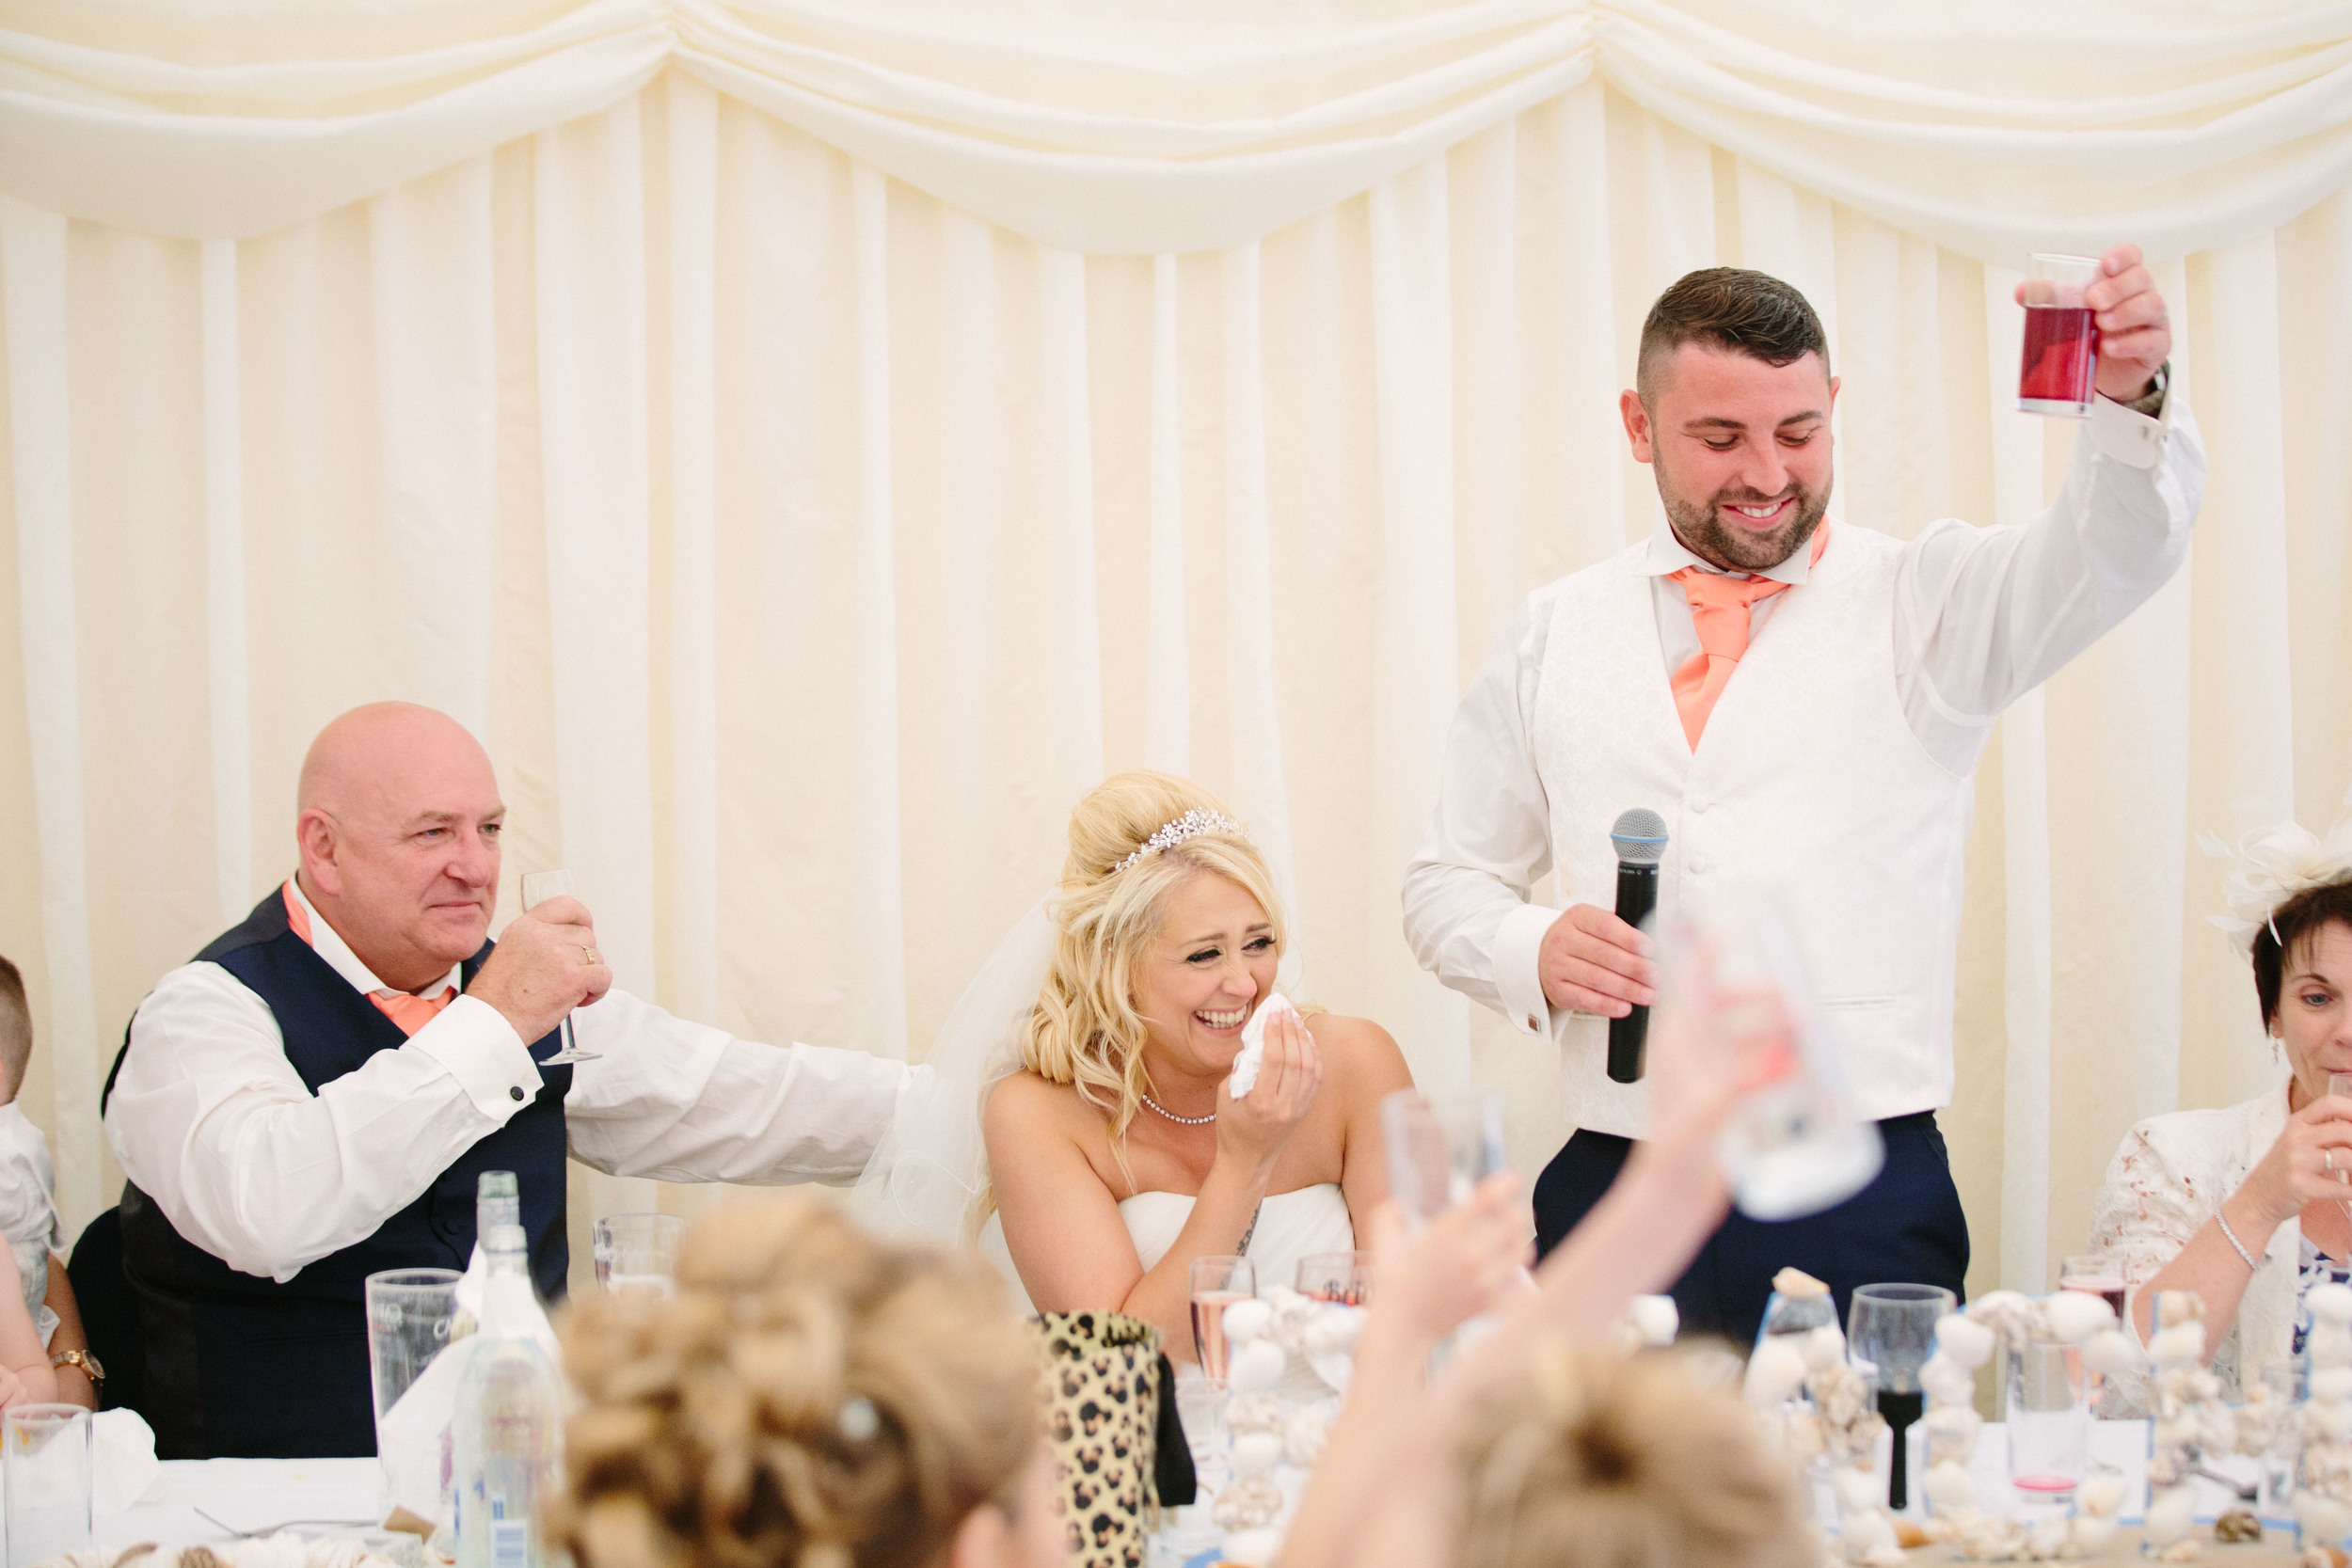 Essex-countryside-wedding-speeches-toast